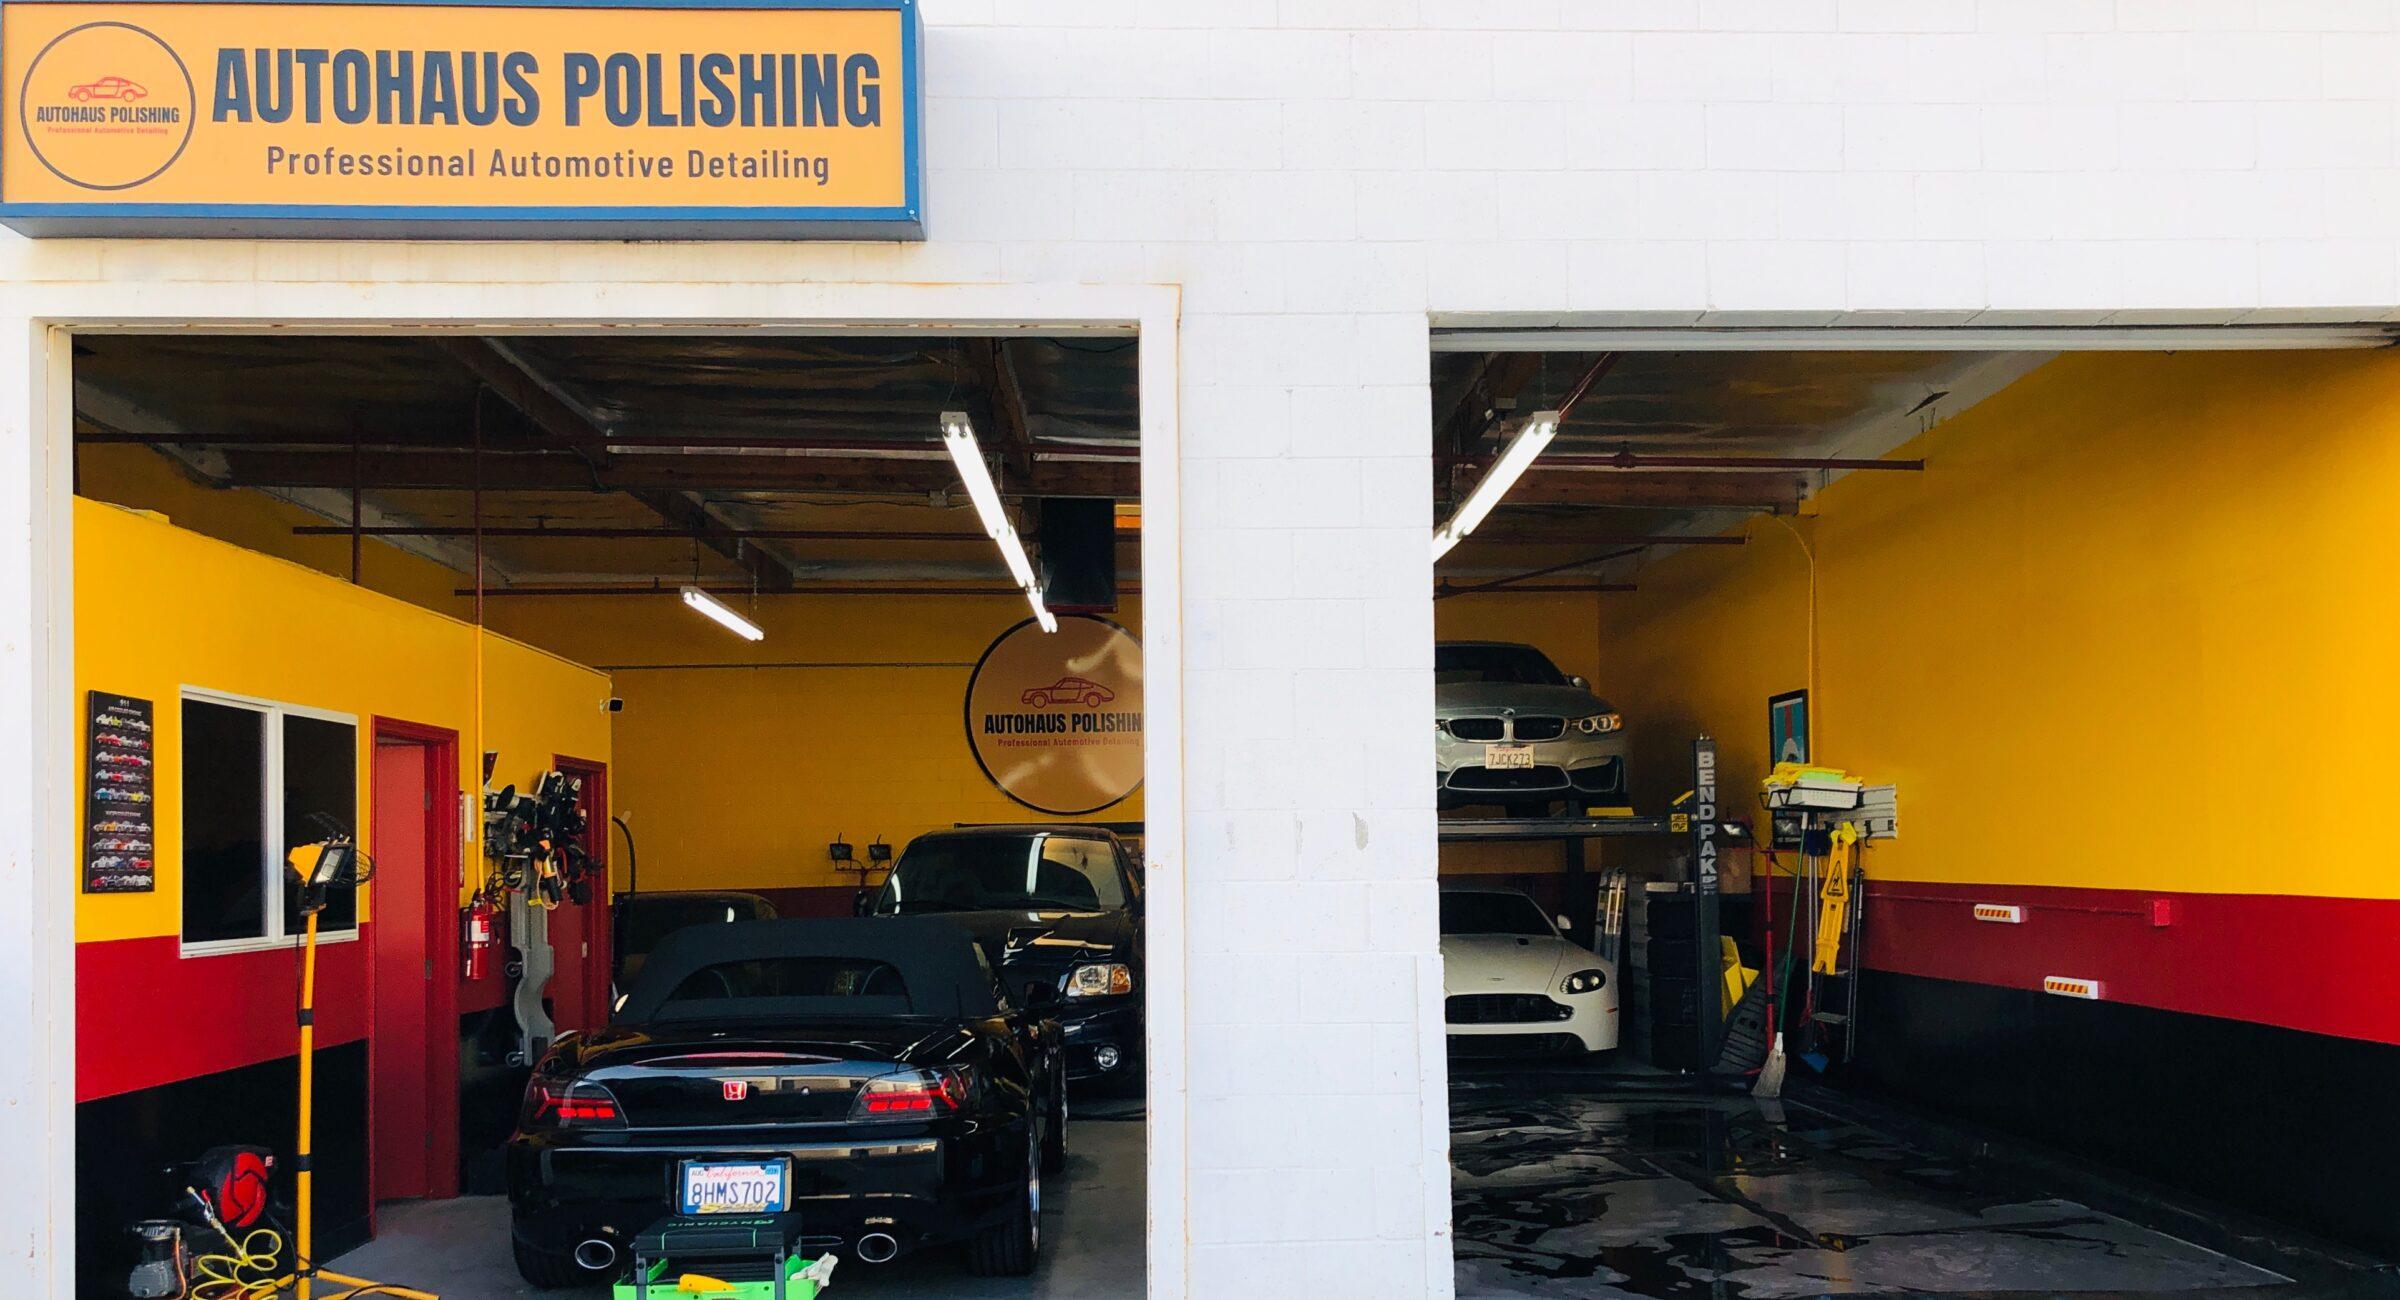 Autohaus Polishing offers car detailing in Santa Clarita